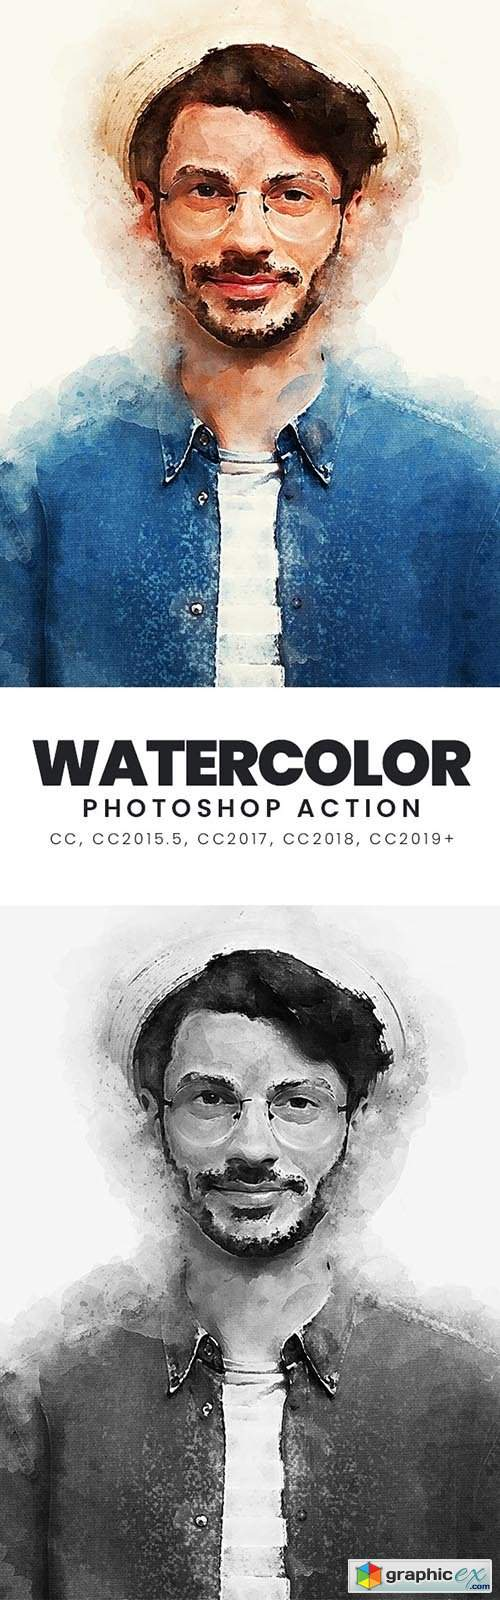 Watercolor Photoshop Action 33396288